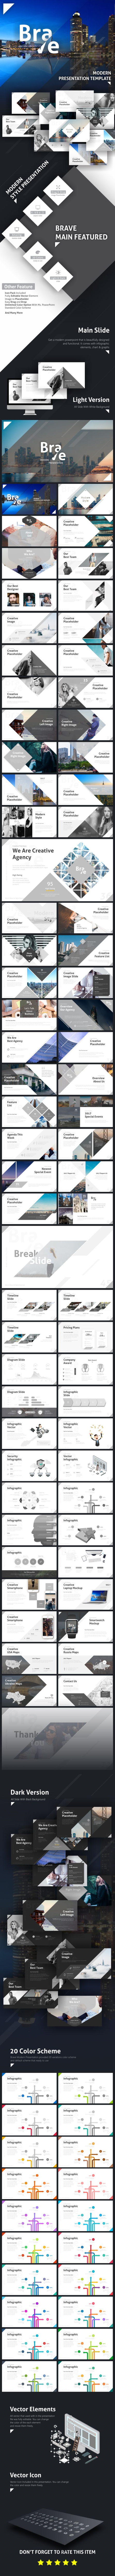 Brave Modern Presentation Template